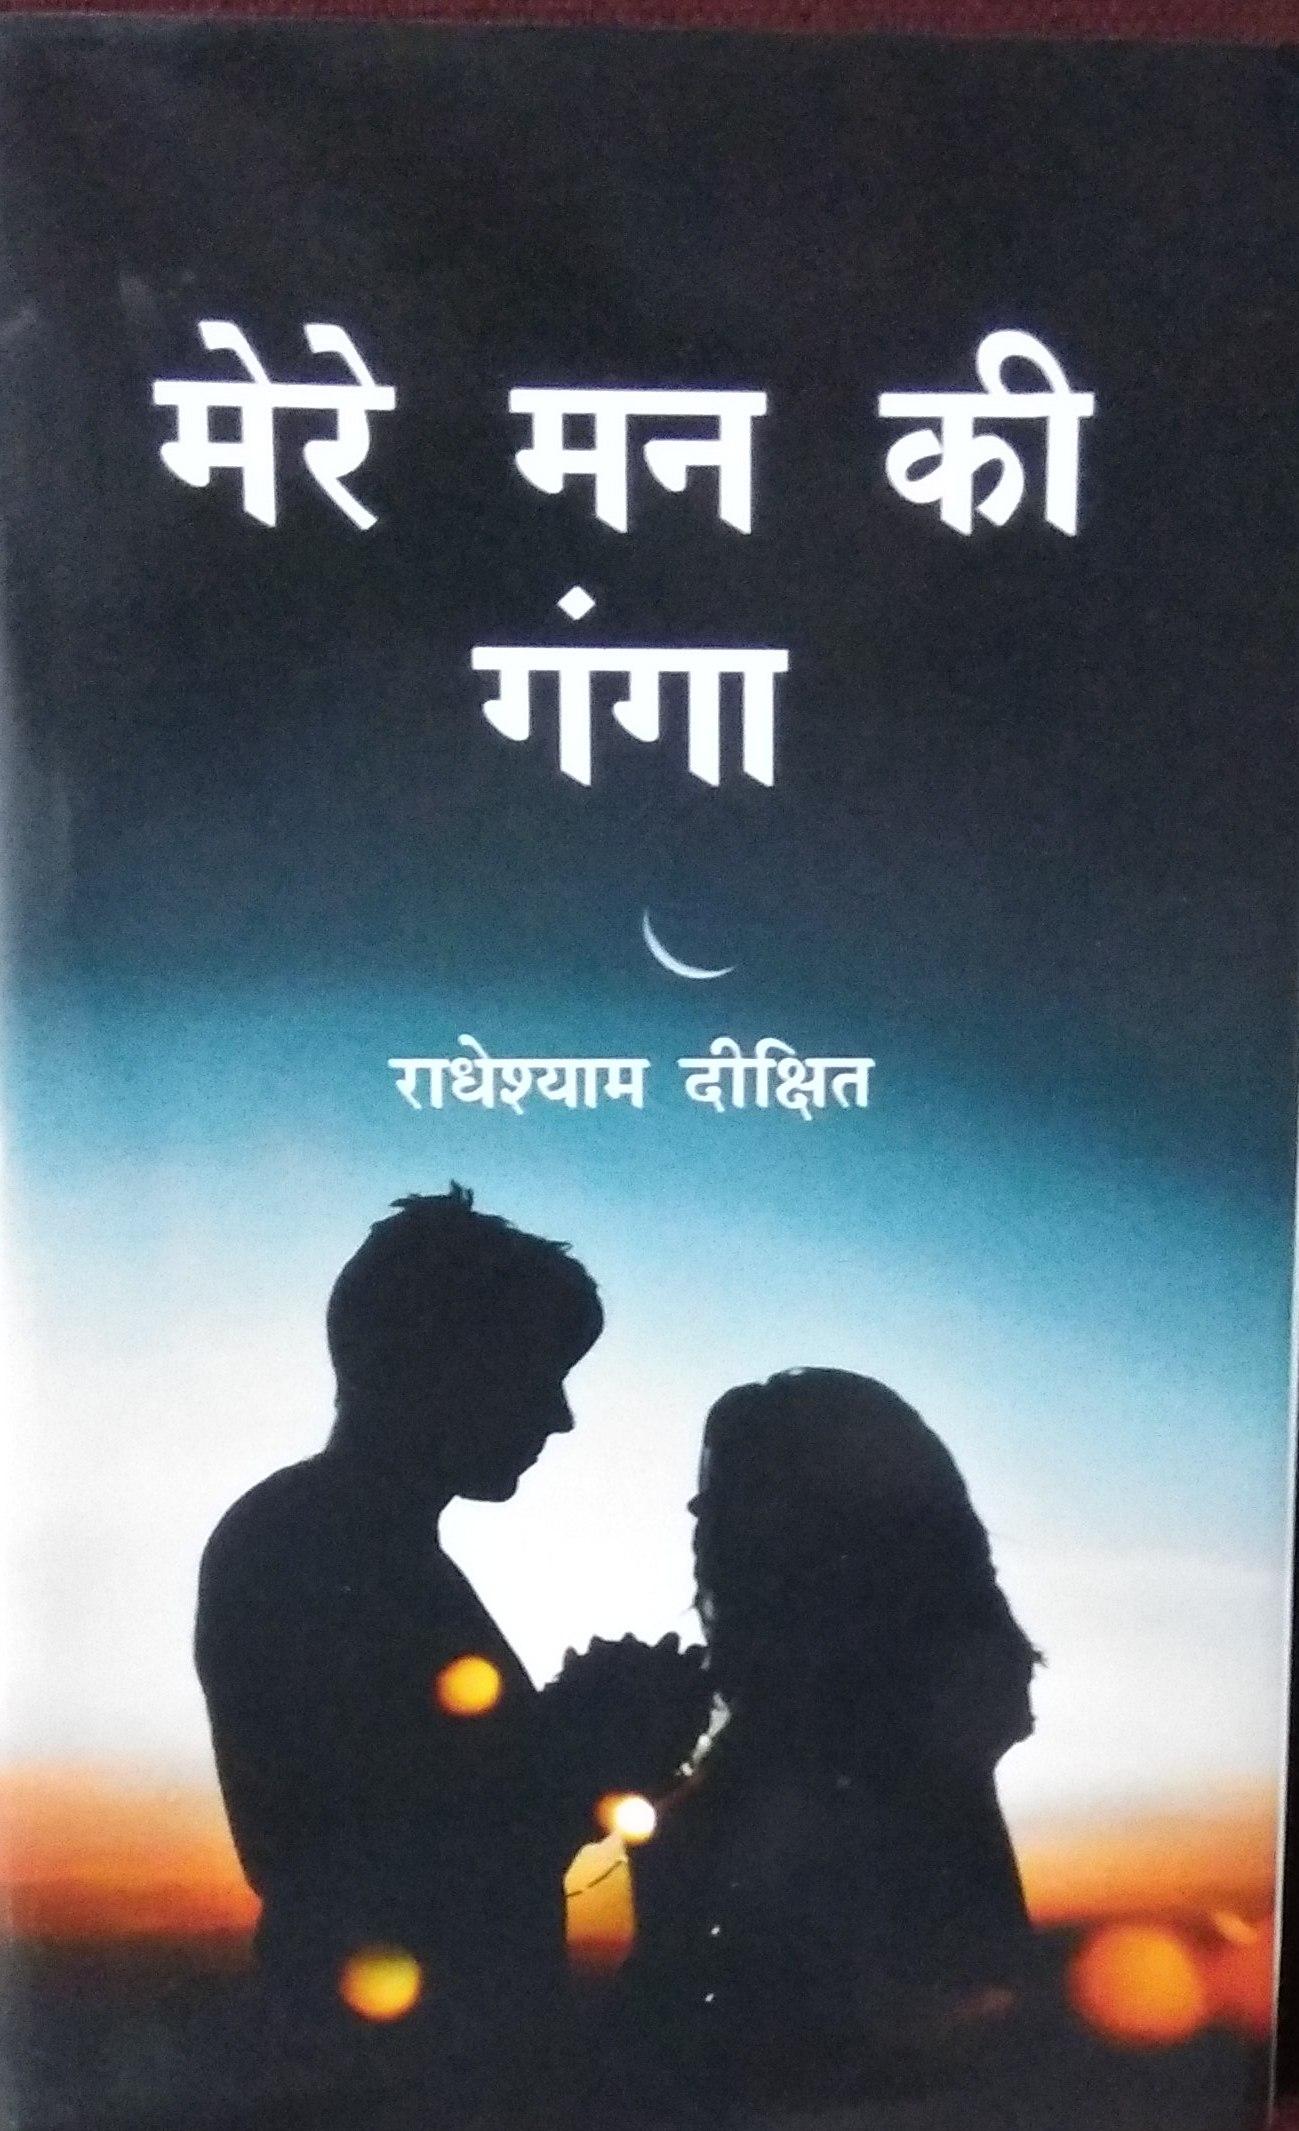 Mere Man ki Ganga (Hindi)